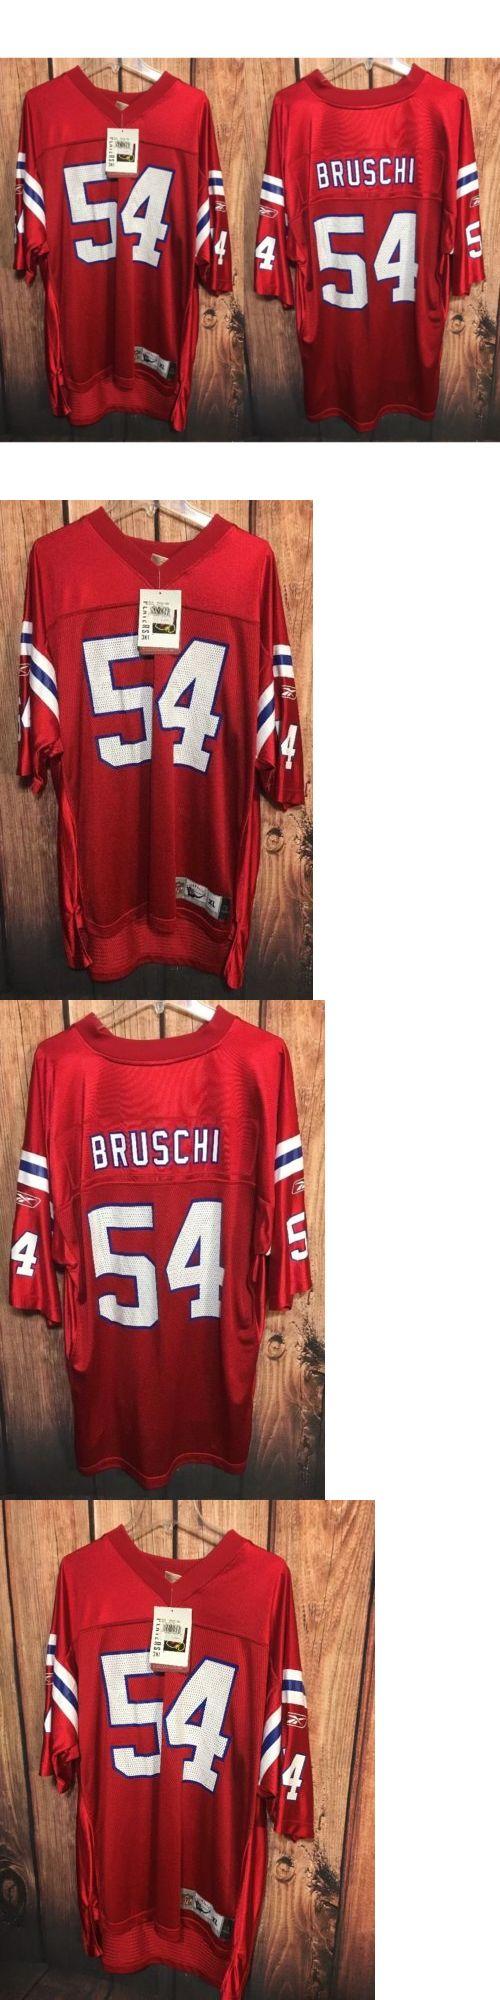 Football-NFL 206: New England Patriots Tedy Bruschi Jersey Throwbacks Reebok Nfl Mens Xl Nwt -> BUY IT NOW ONLY: $74.95 on eBay!